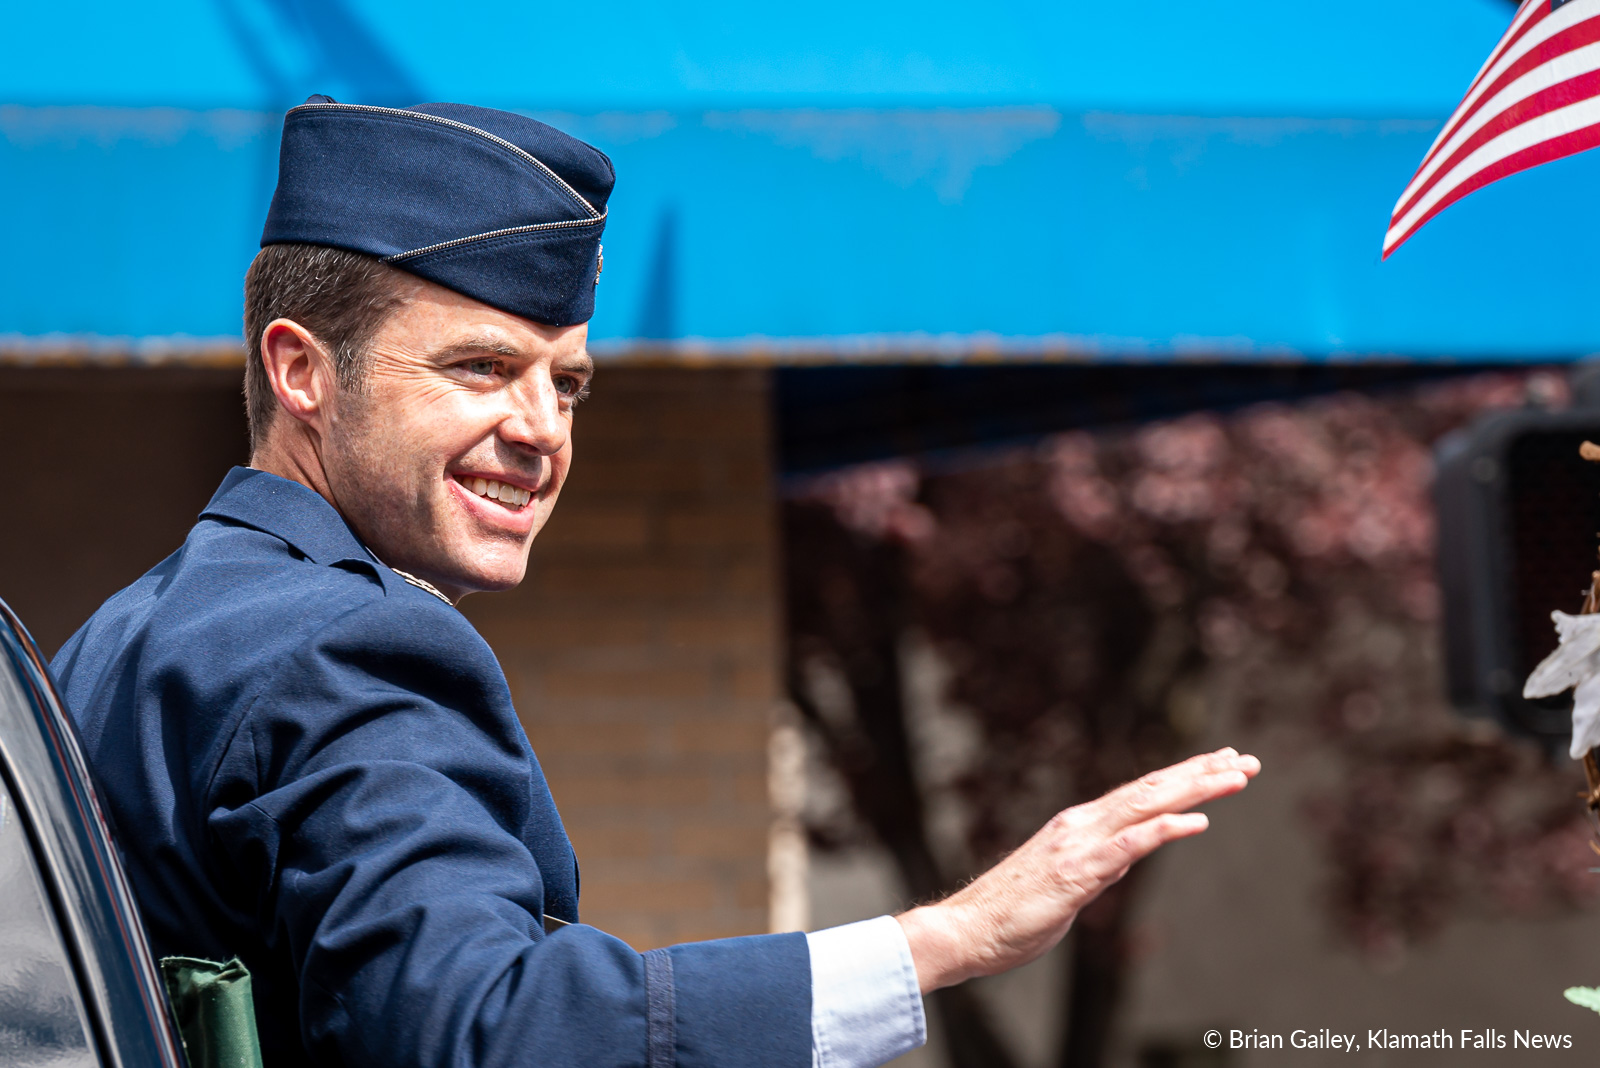 173rd FW Vice-Commander, Col. Jeff Edwards, Grand Marshal of the 2019 Memorial Day parade. May 27, 2019. (Image, Brian Gailey / Klamath Falls News).